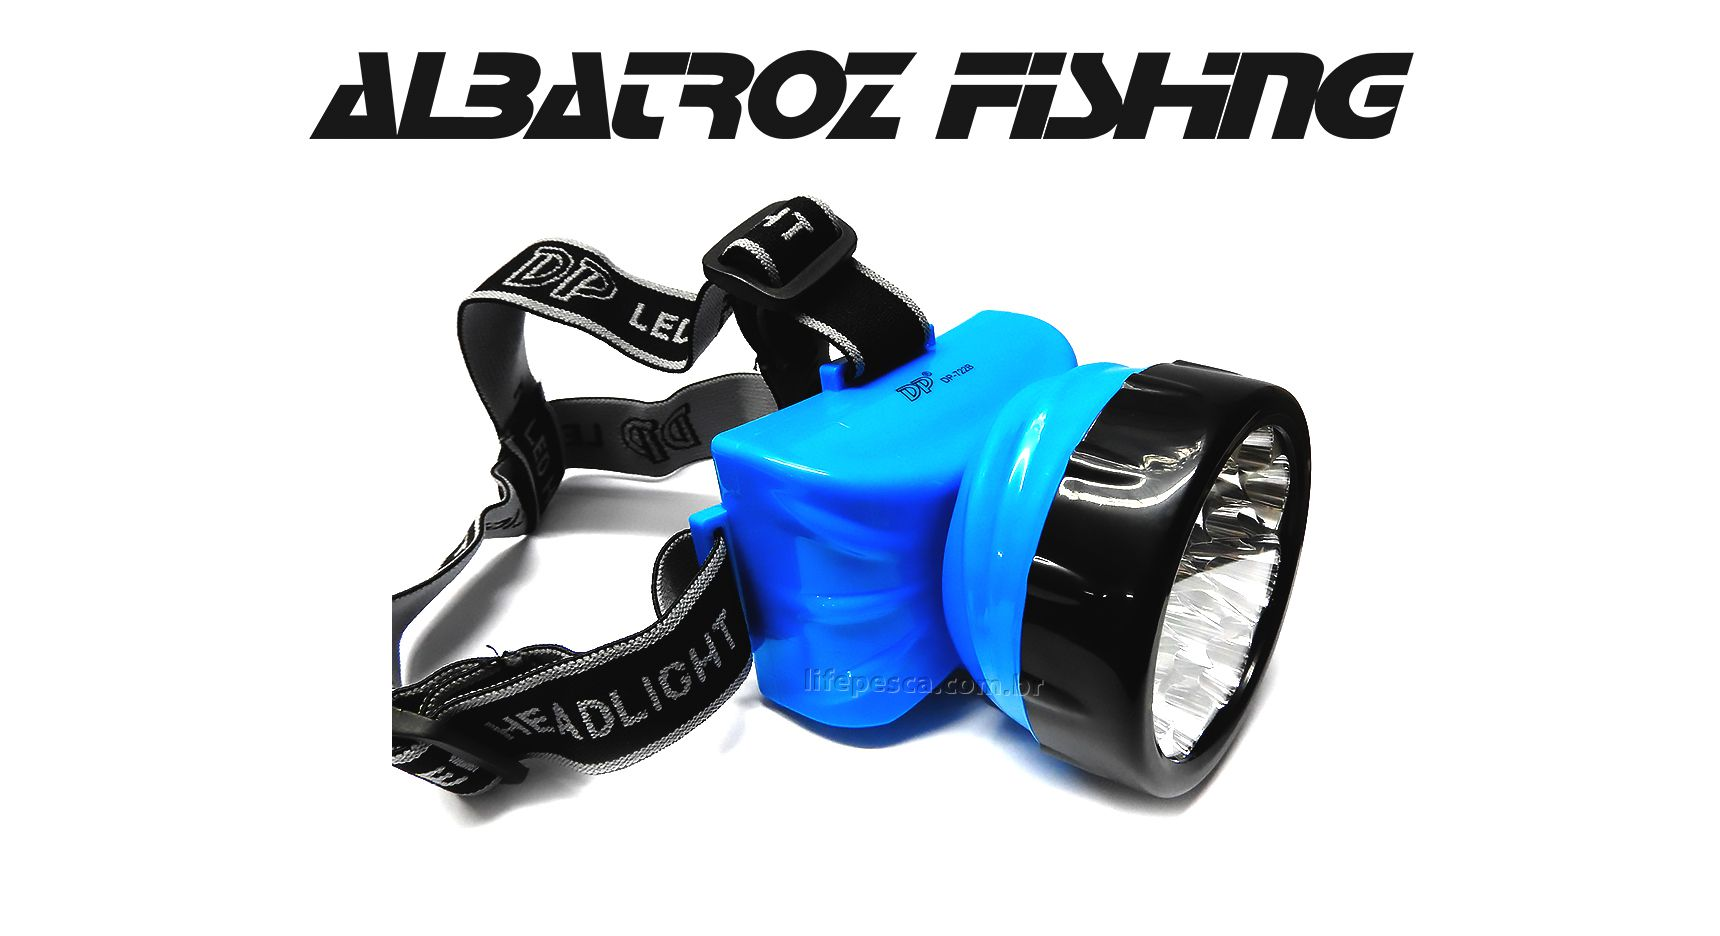 Lanterna Led Para Cabeça Recarregável - Albatroz Fishing - LED-722B